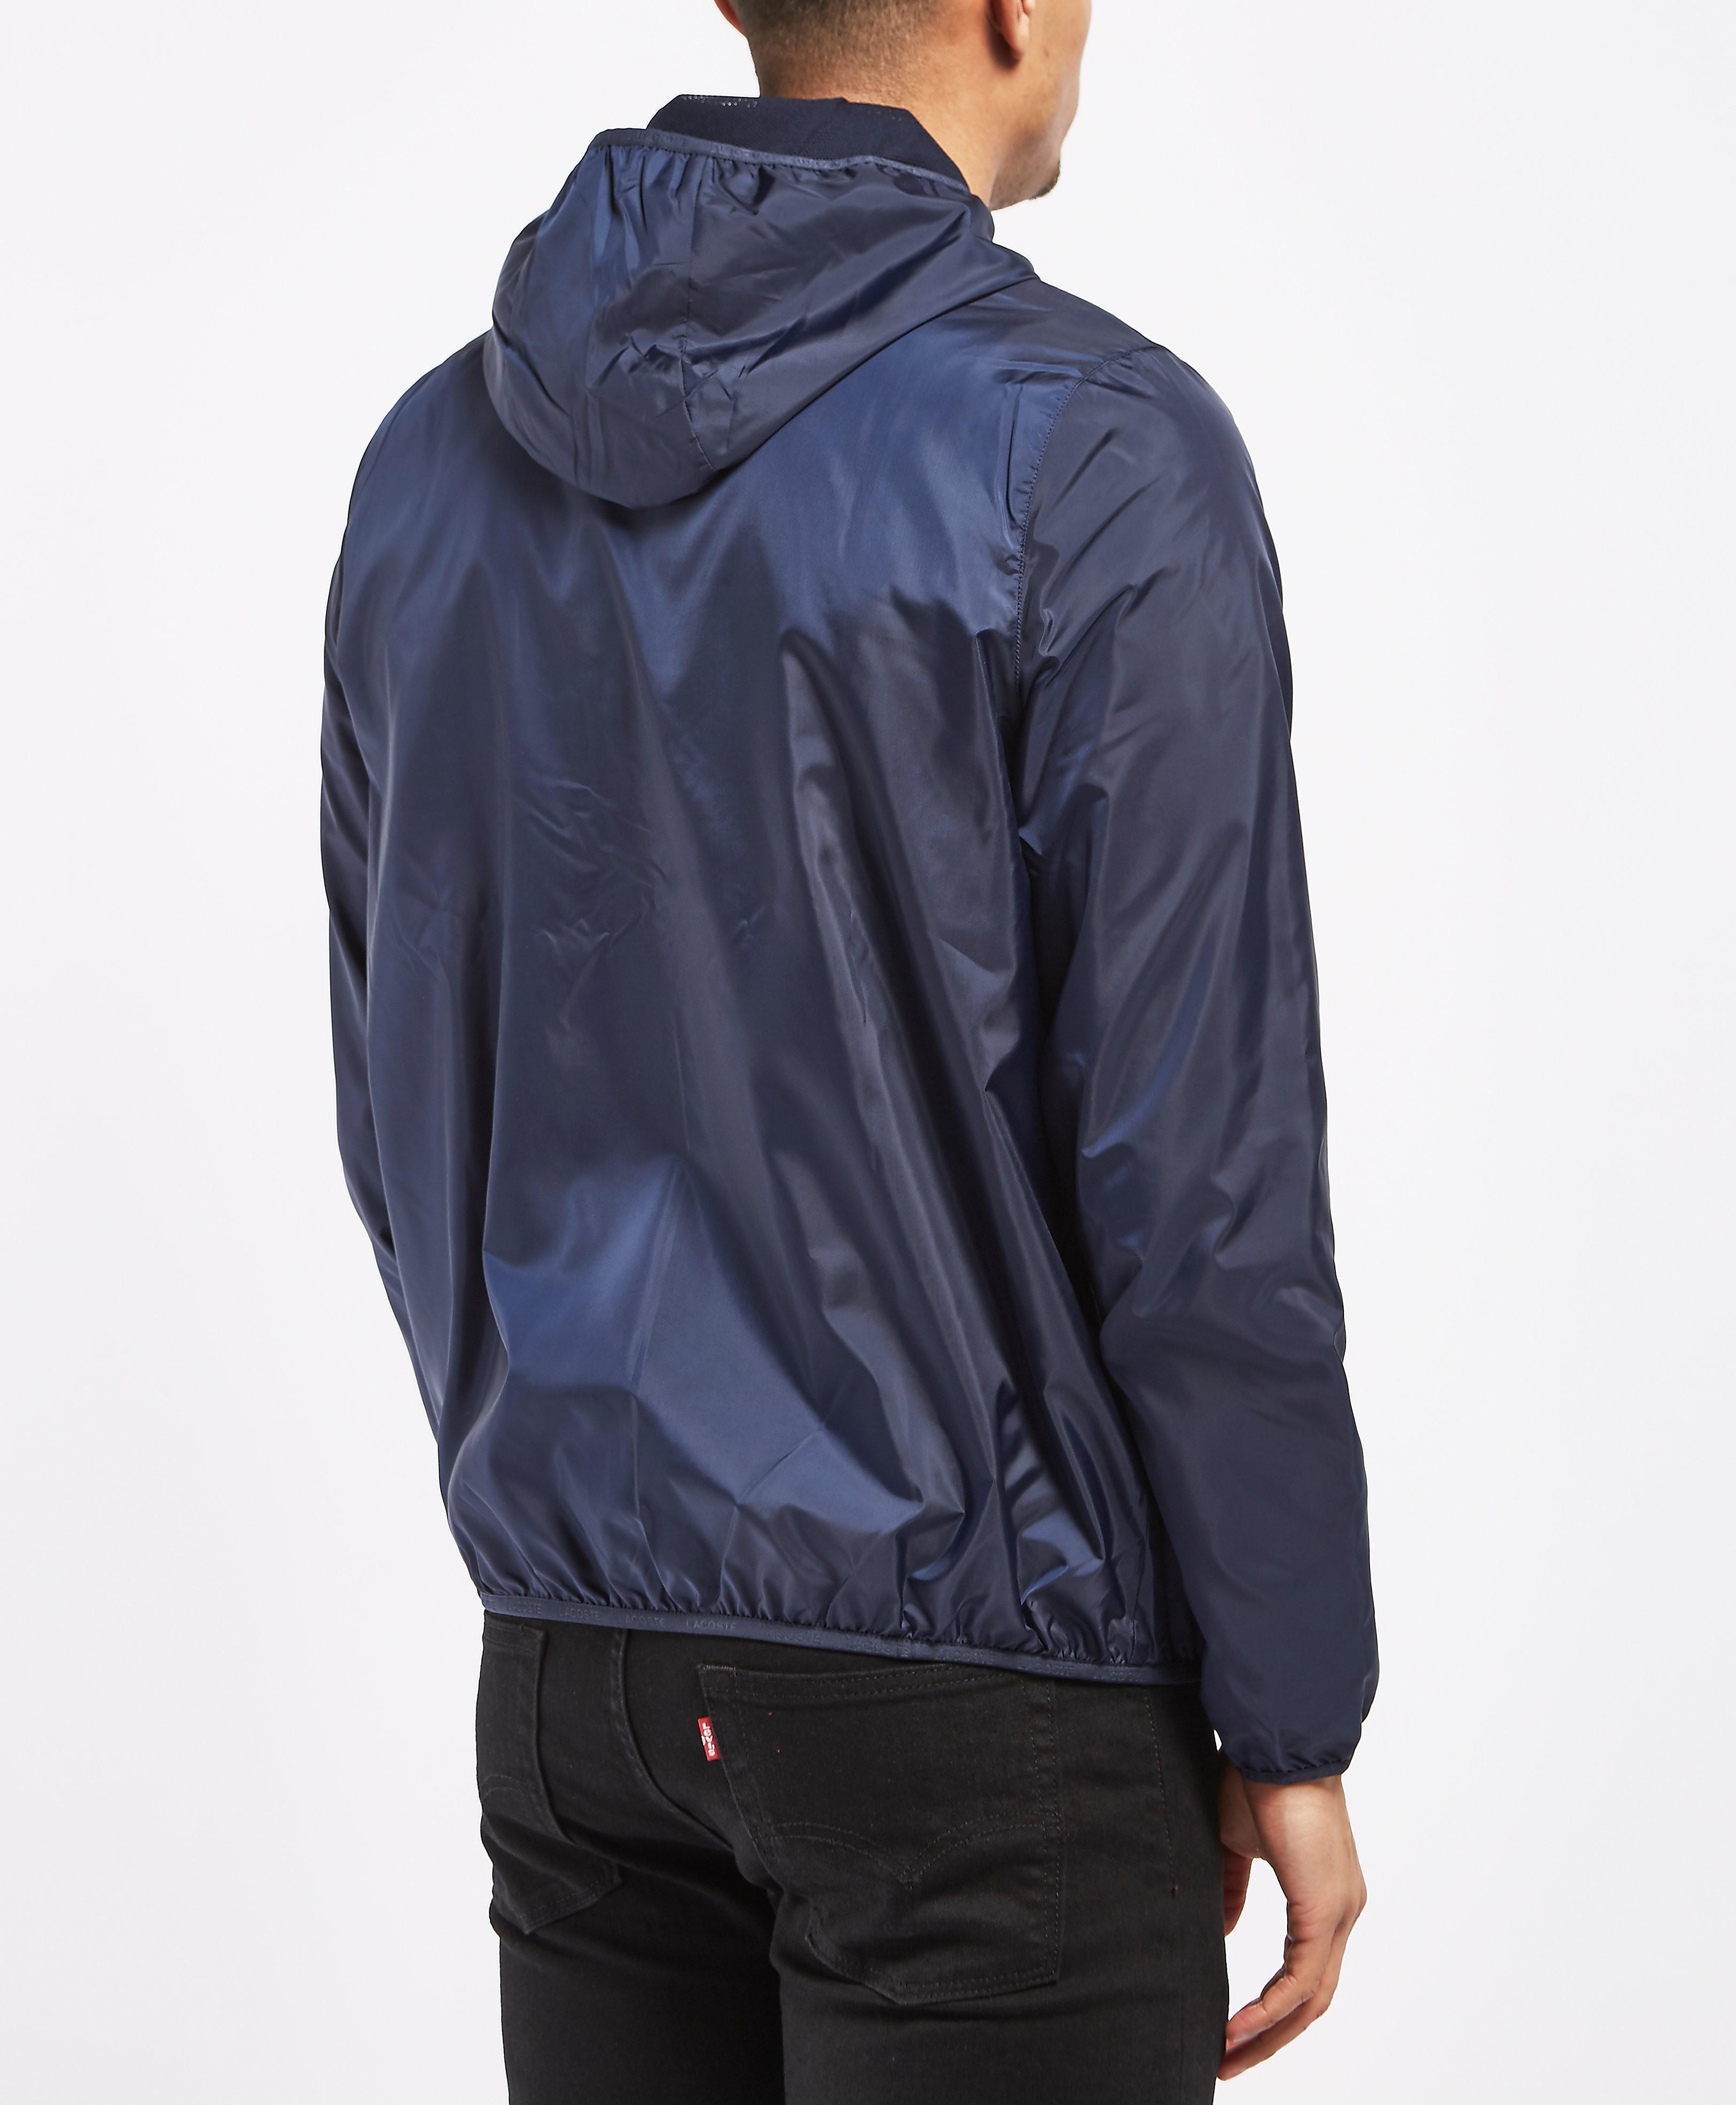 Lacoste Full Zip Hooded Bomber Jacket